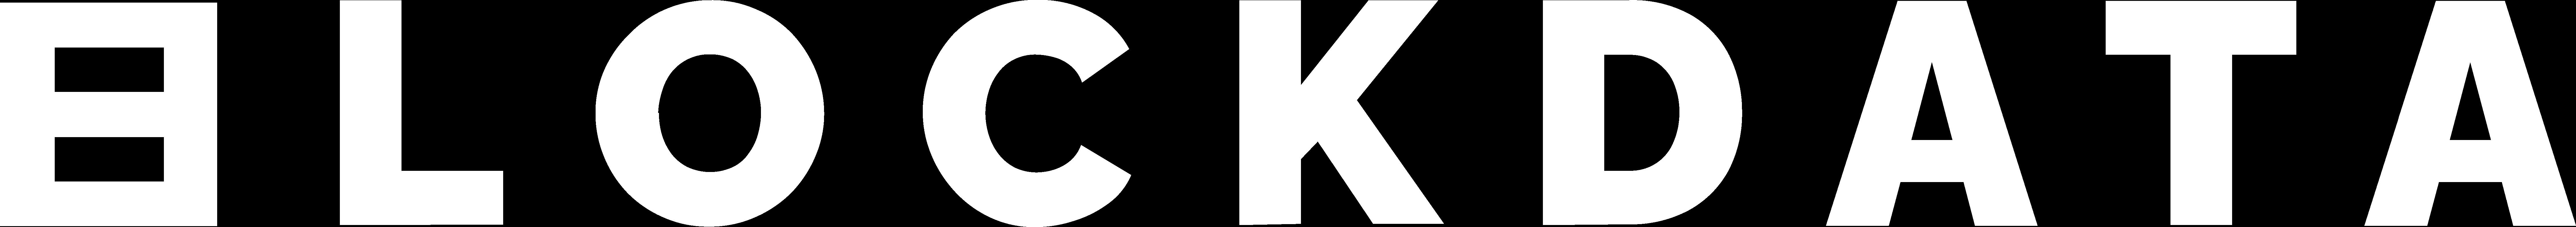 Blockdata logo